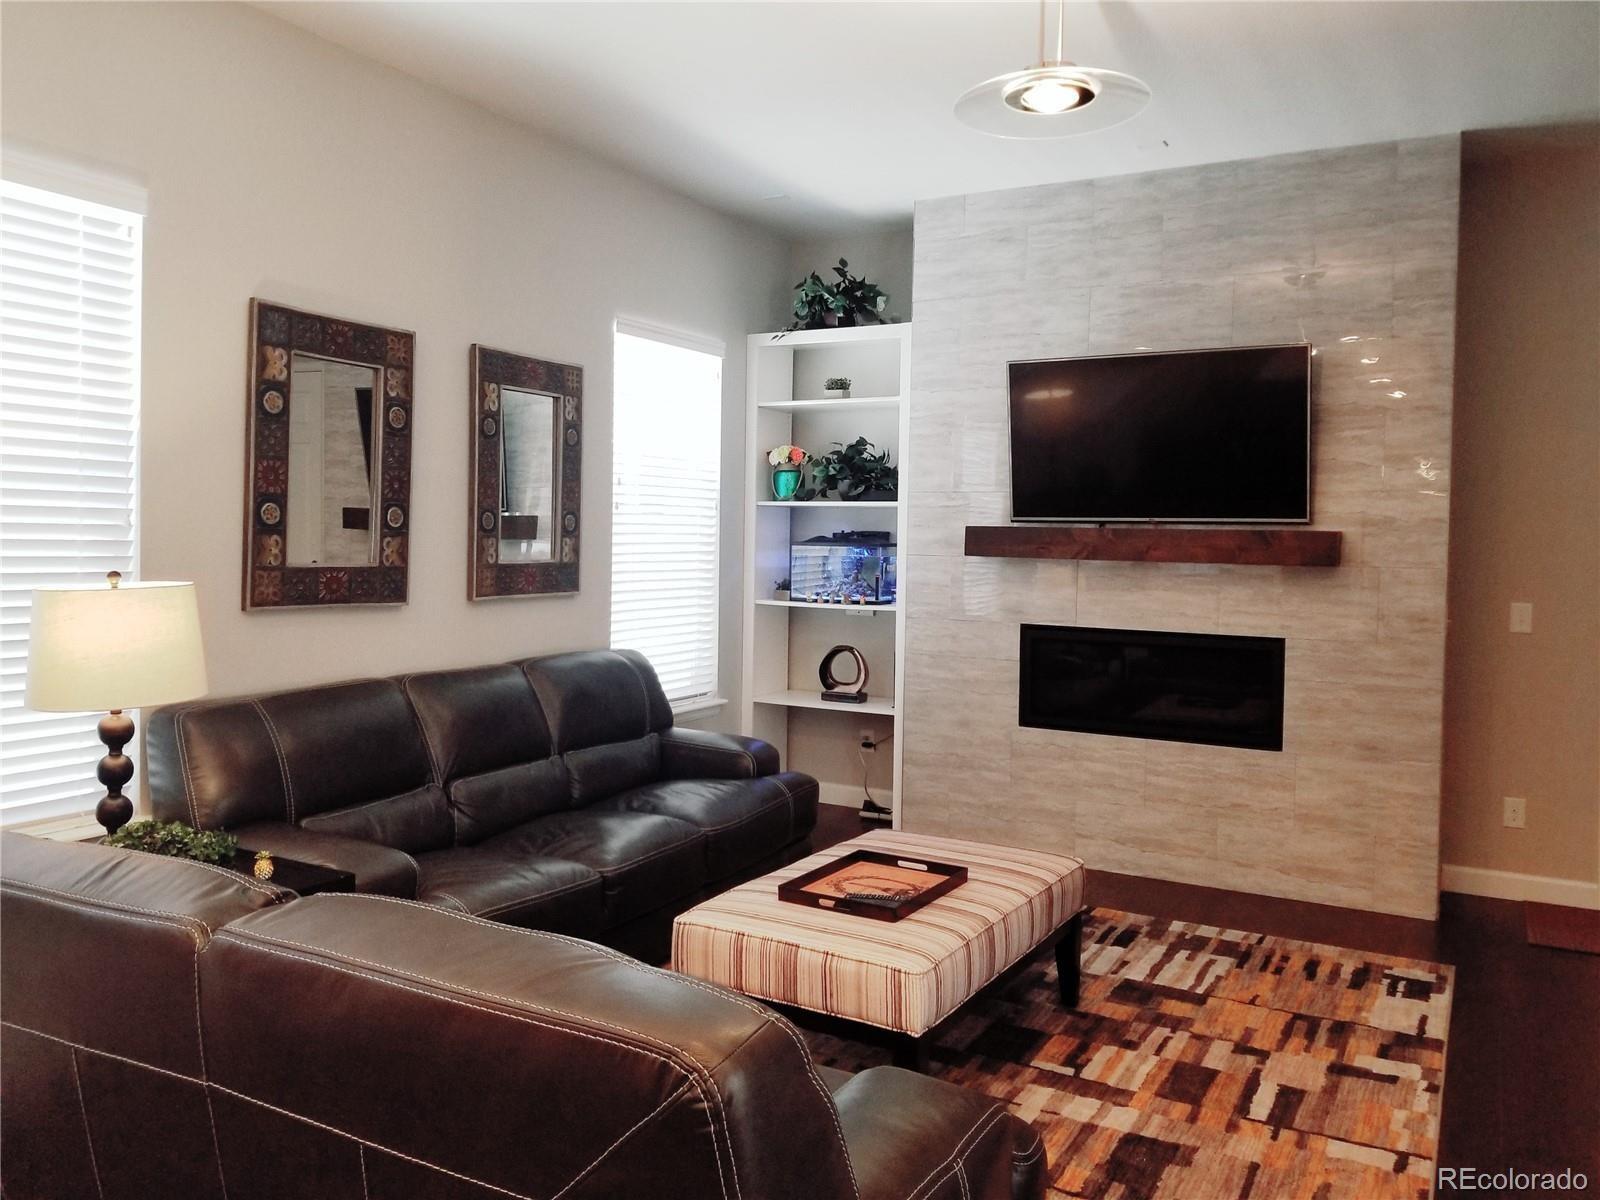 MLS# 6069130 - 1 - 13262  E Caley Place, Arapahoe, CO 80111